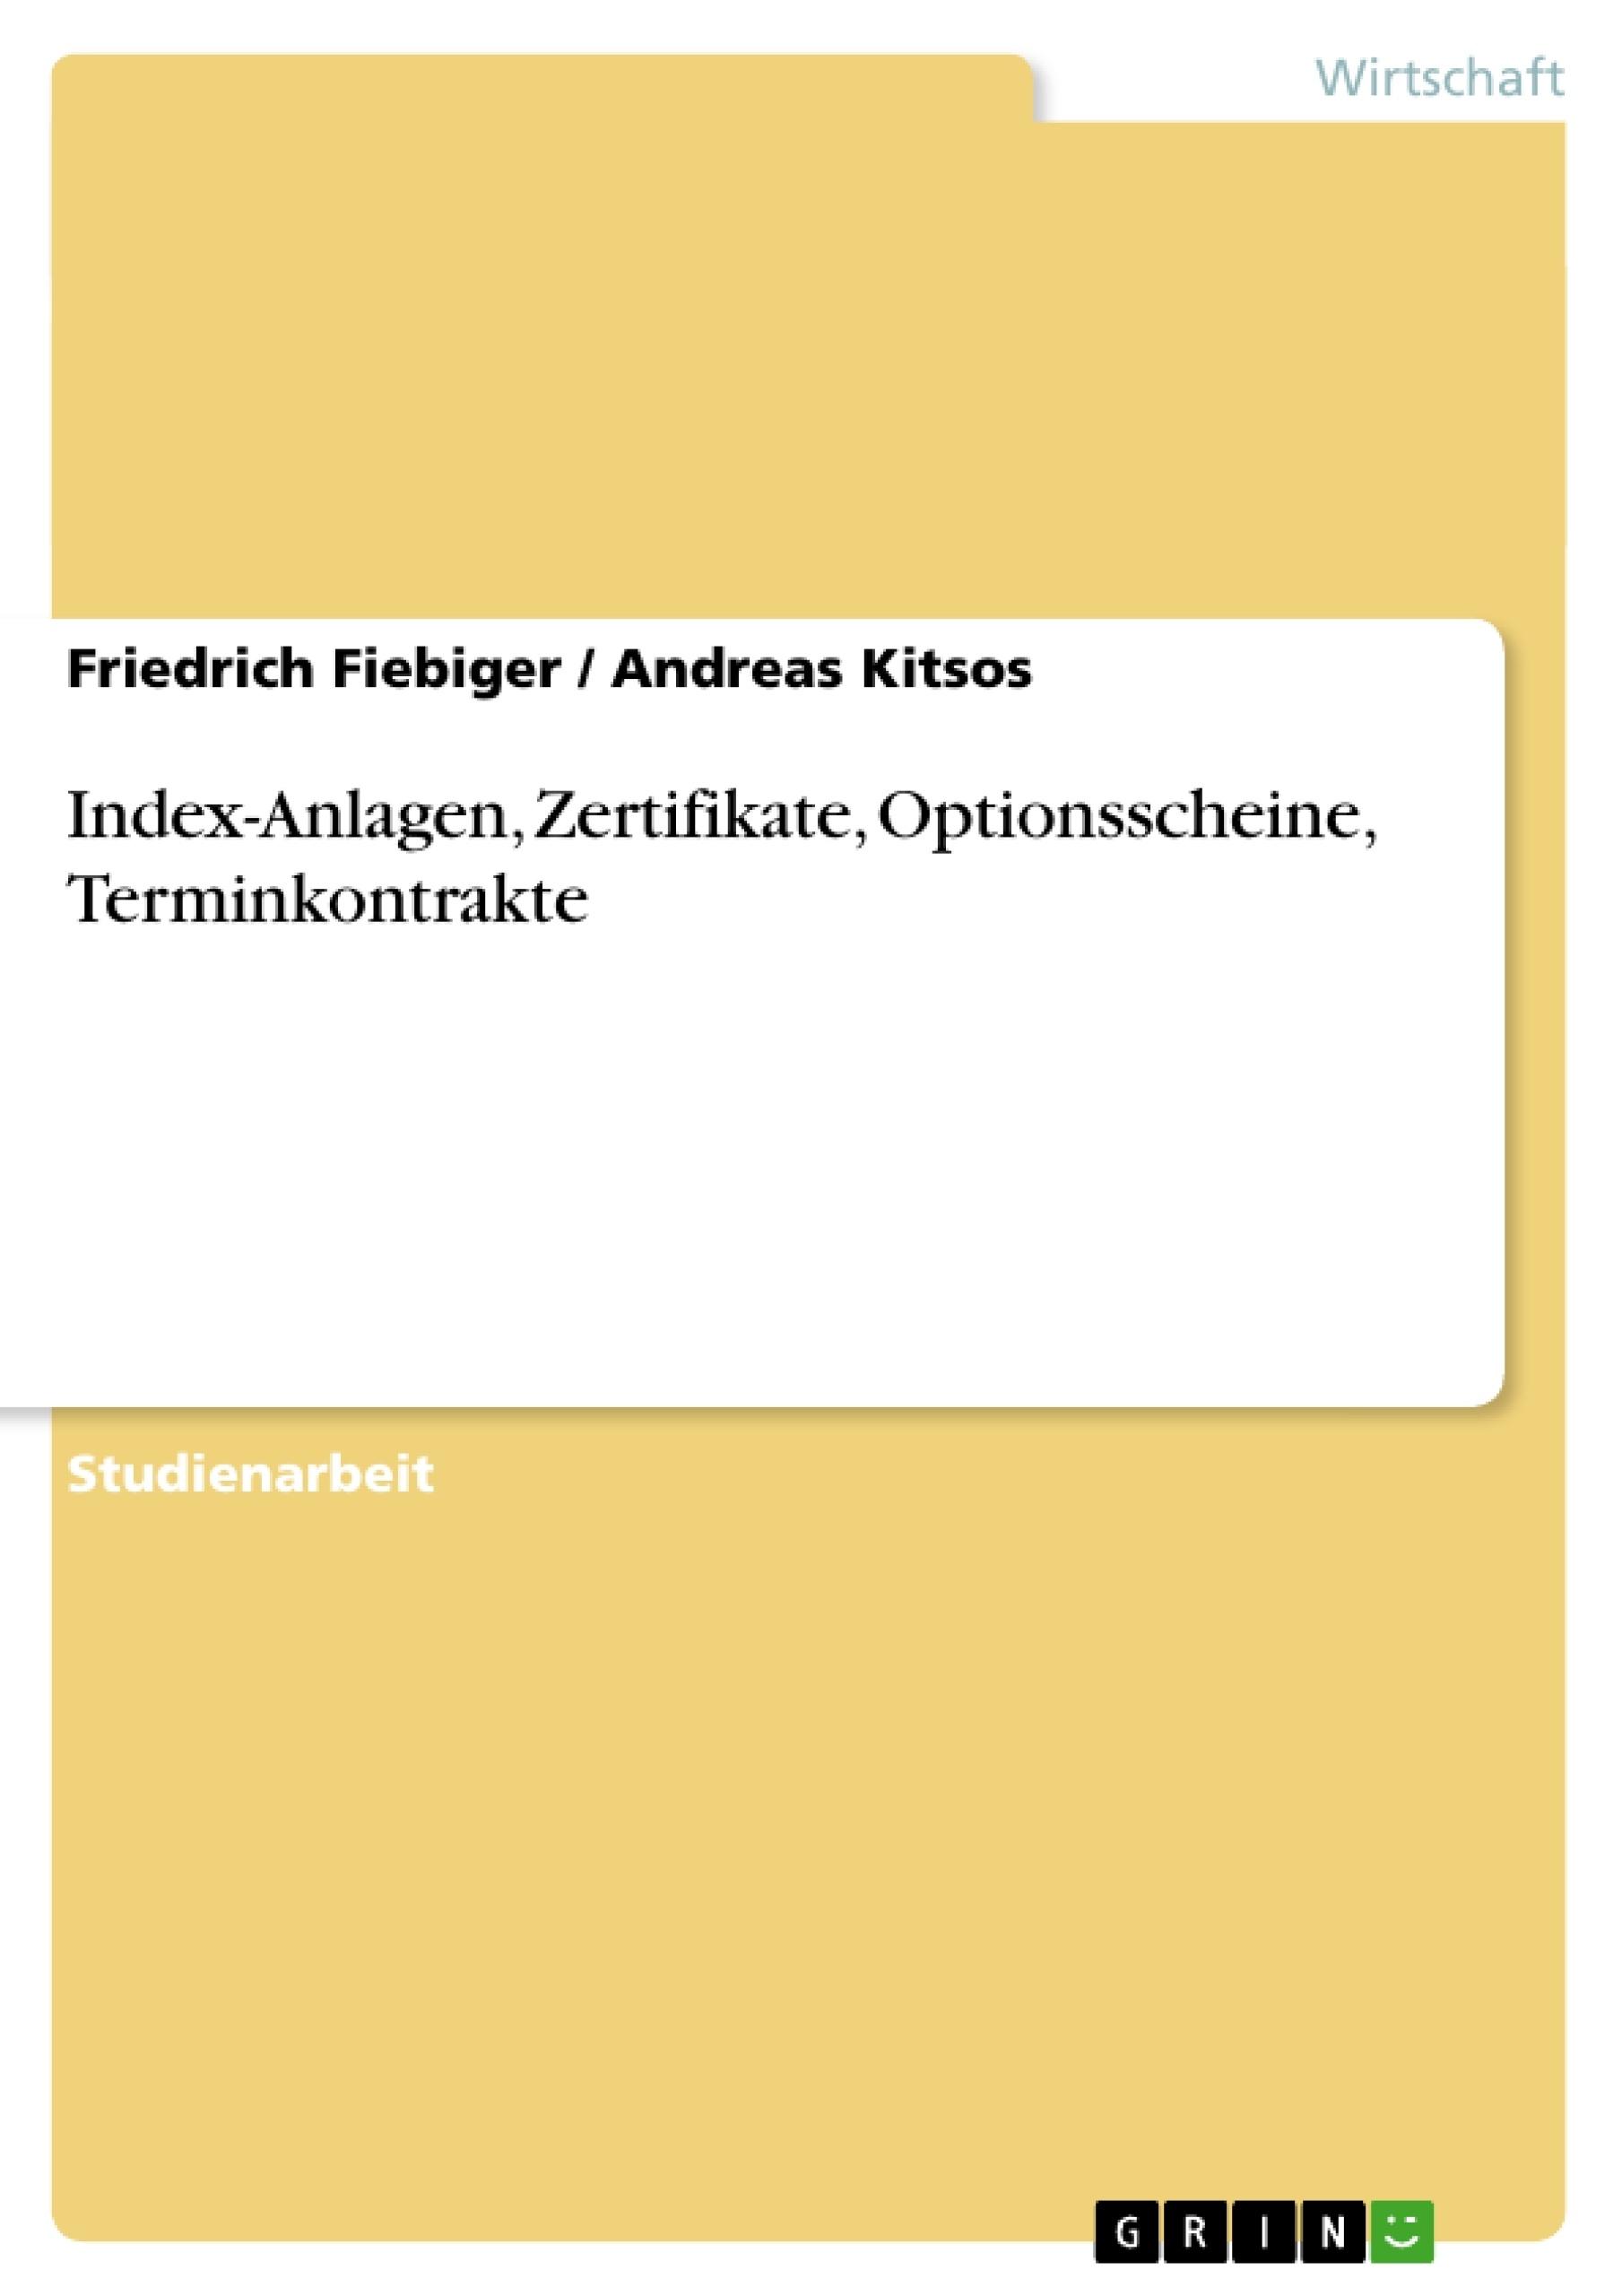 http://trustgates.com/ebook.php?q=pdf-logische-untersuchungen-bd-2-vi-4-auflage-1968.html